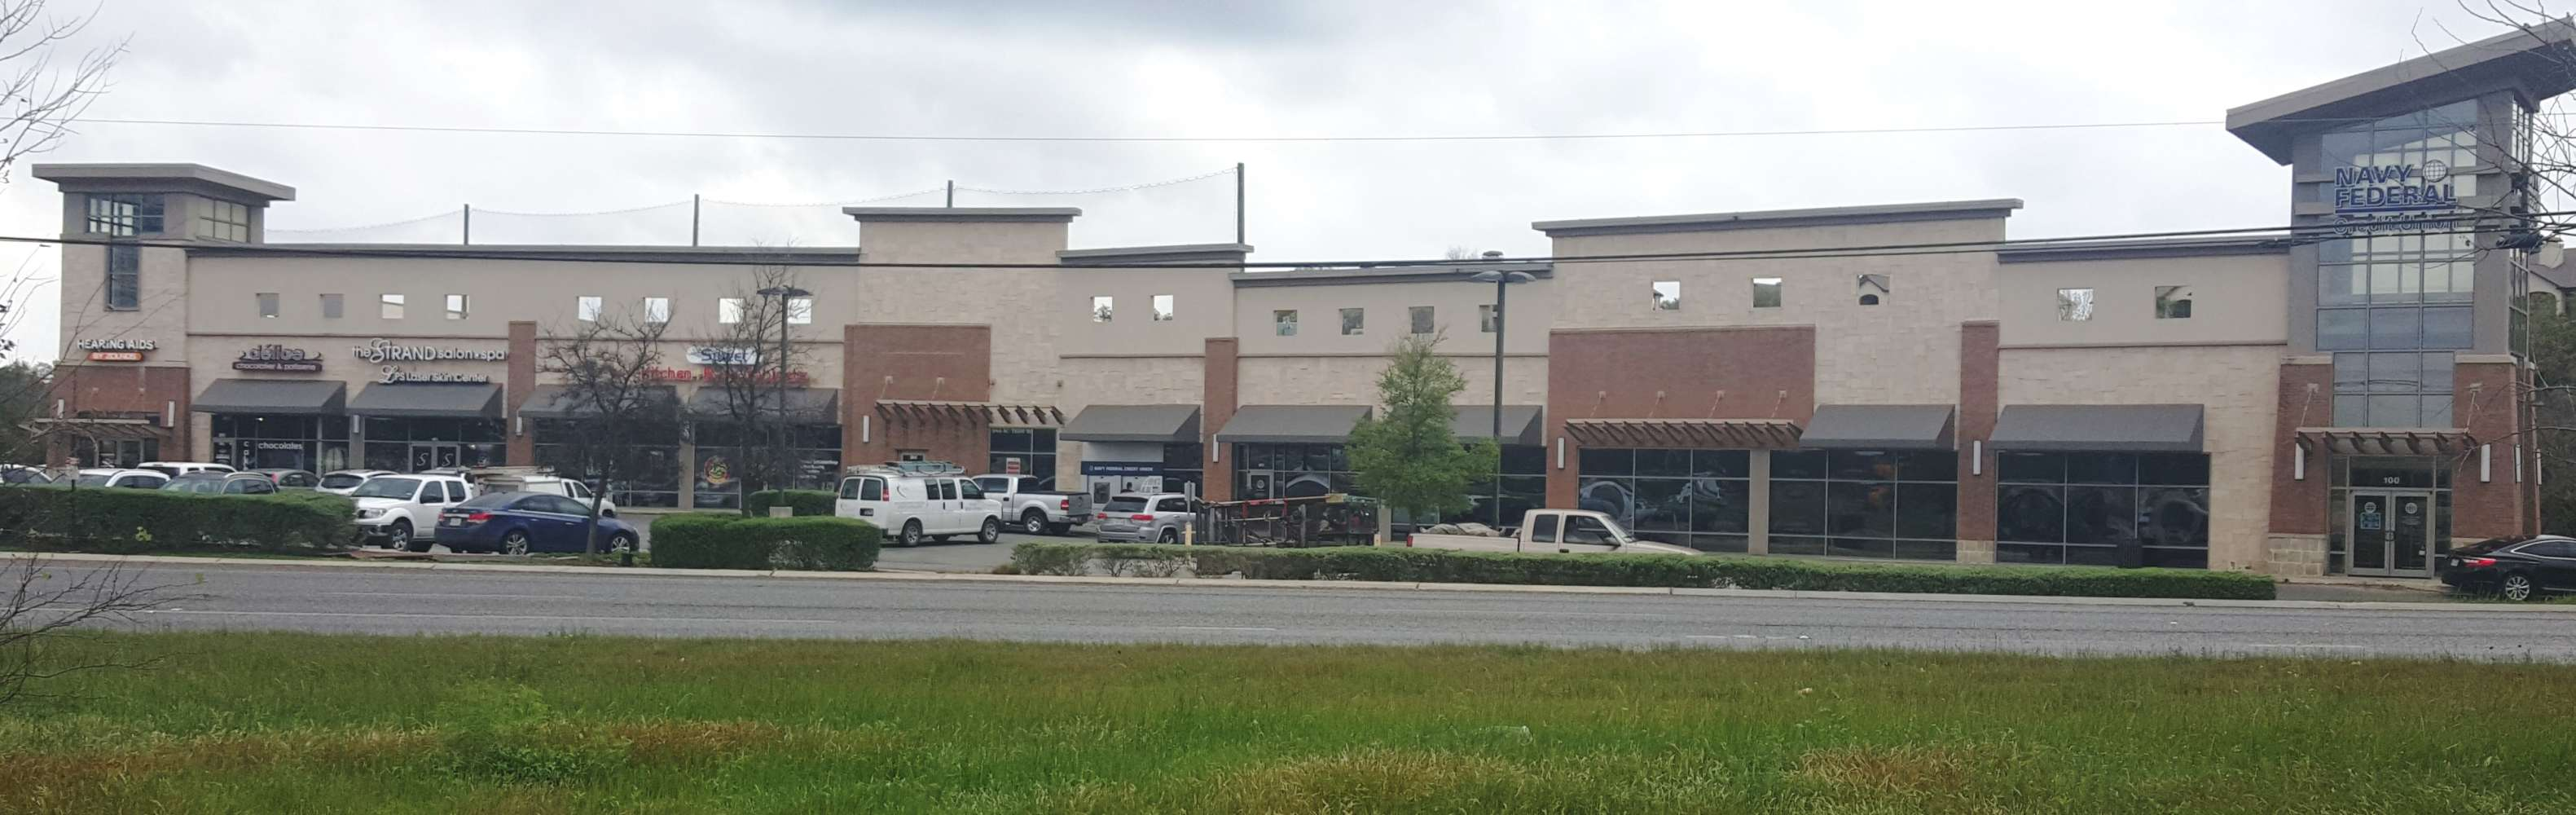 Retail San antonio, 78232 - Canyon Creek